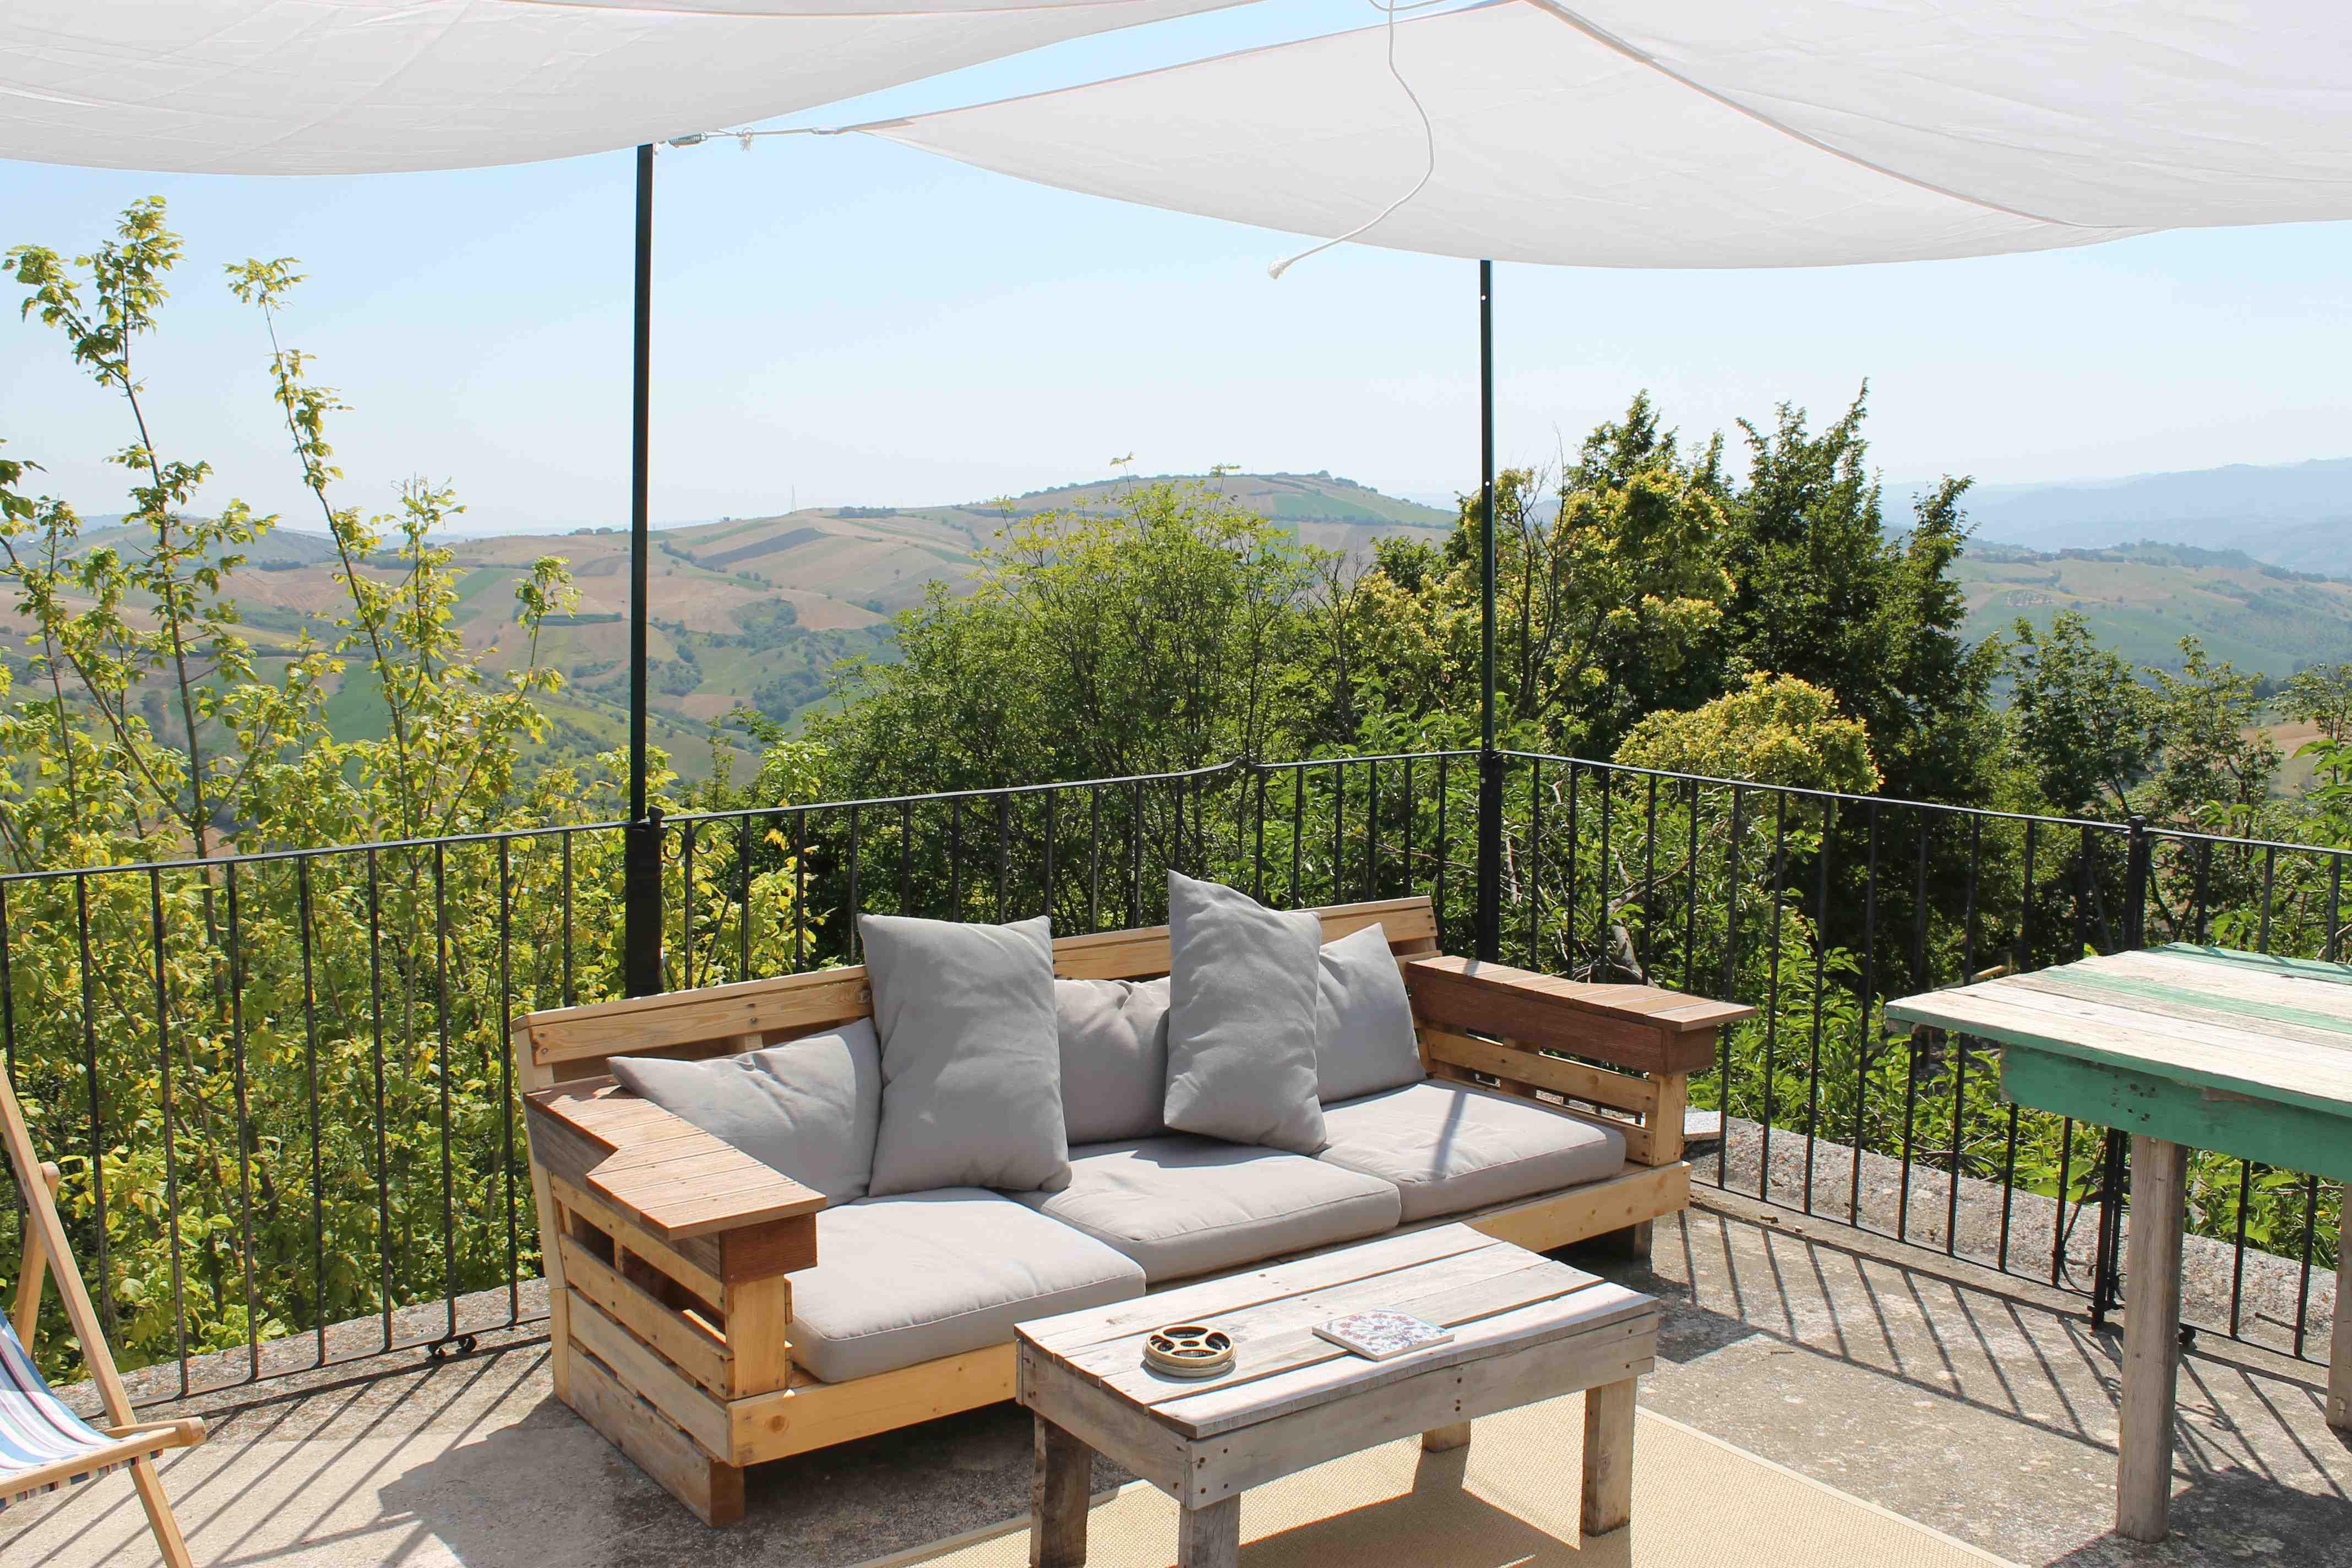 Idea diy sofa pallet untuk perabot balkoni rumah